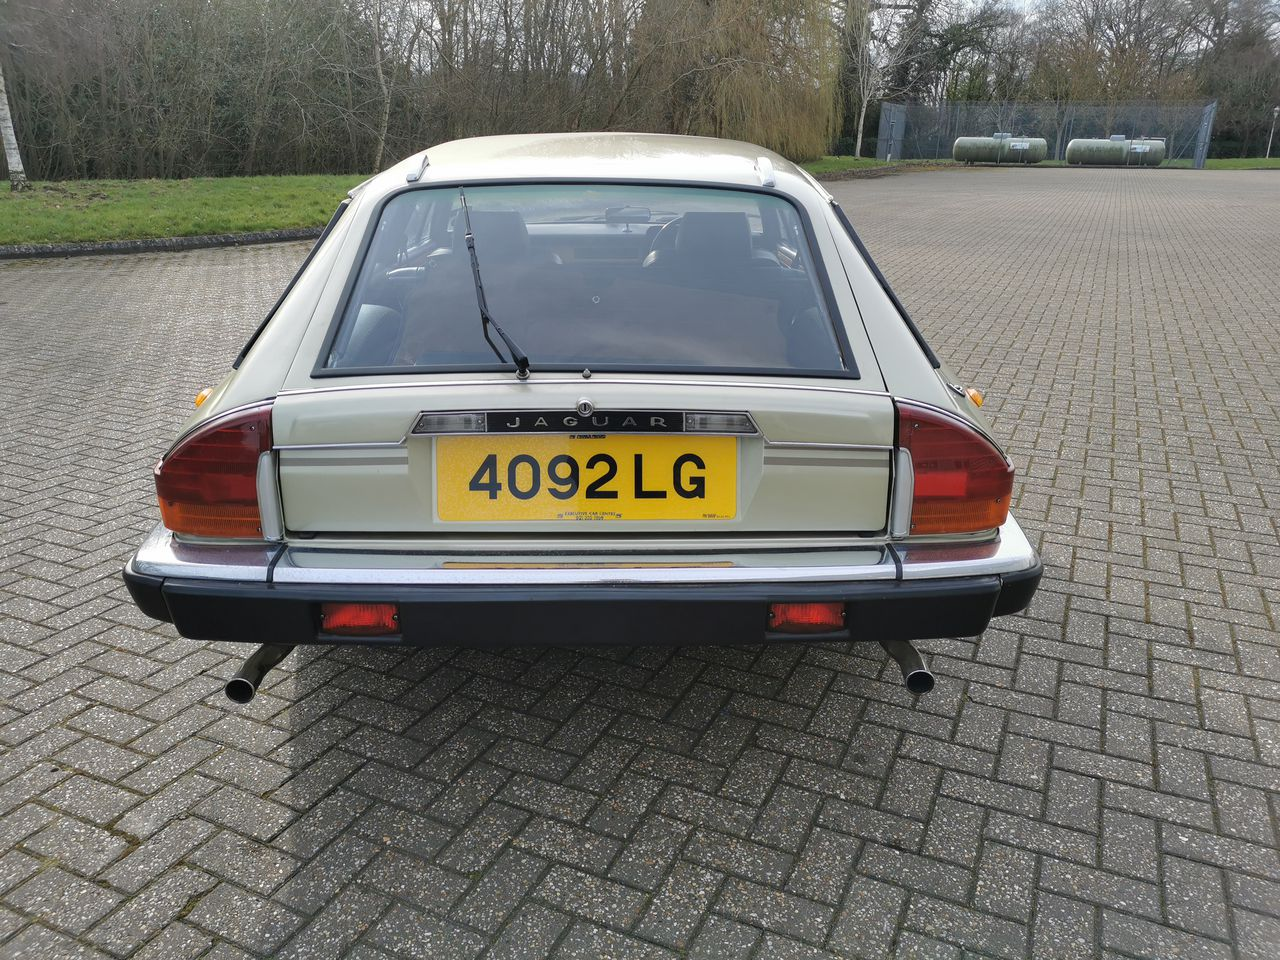 1983 Lynx Eventer rear